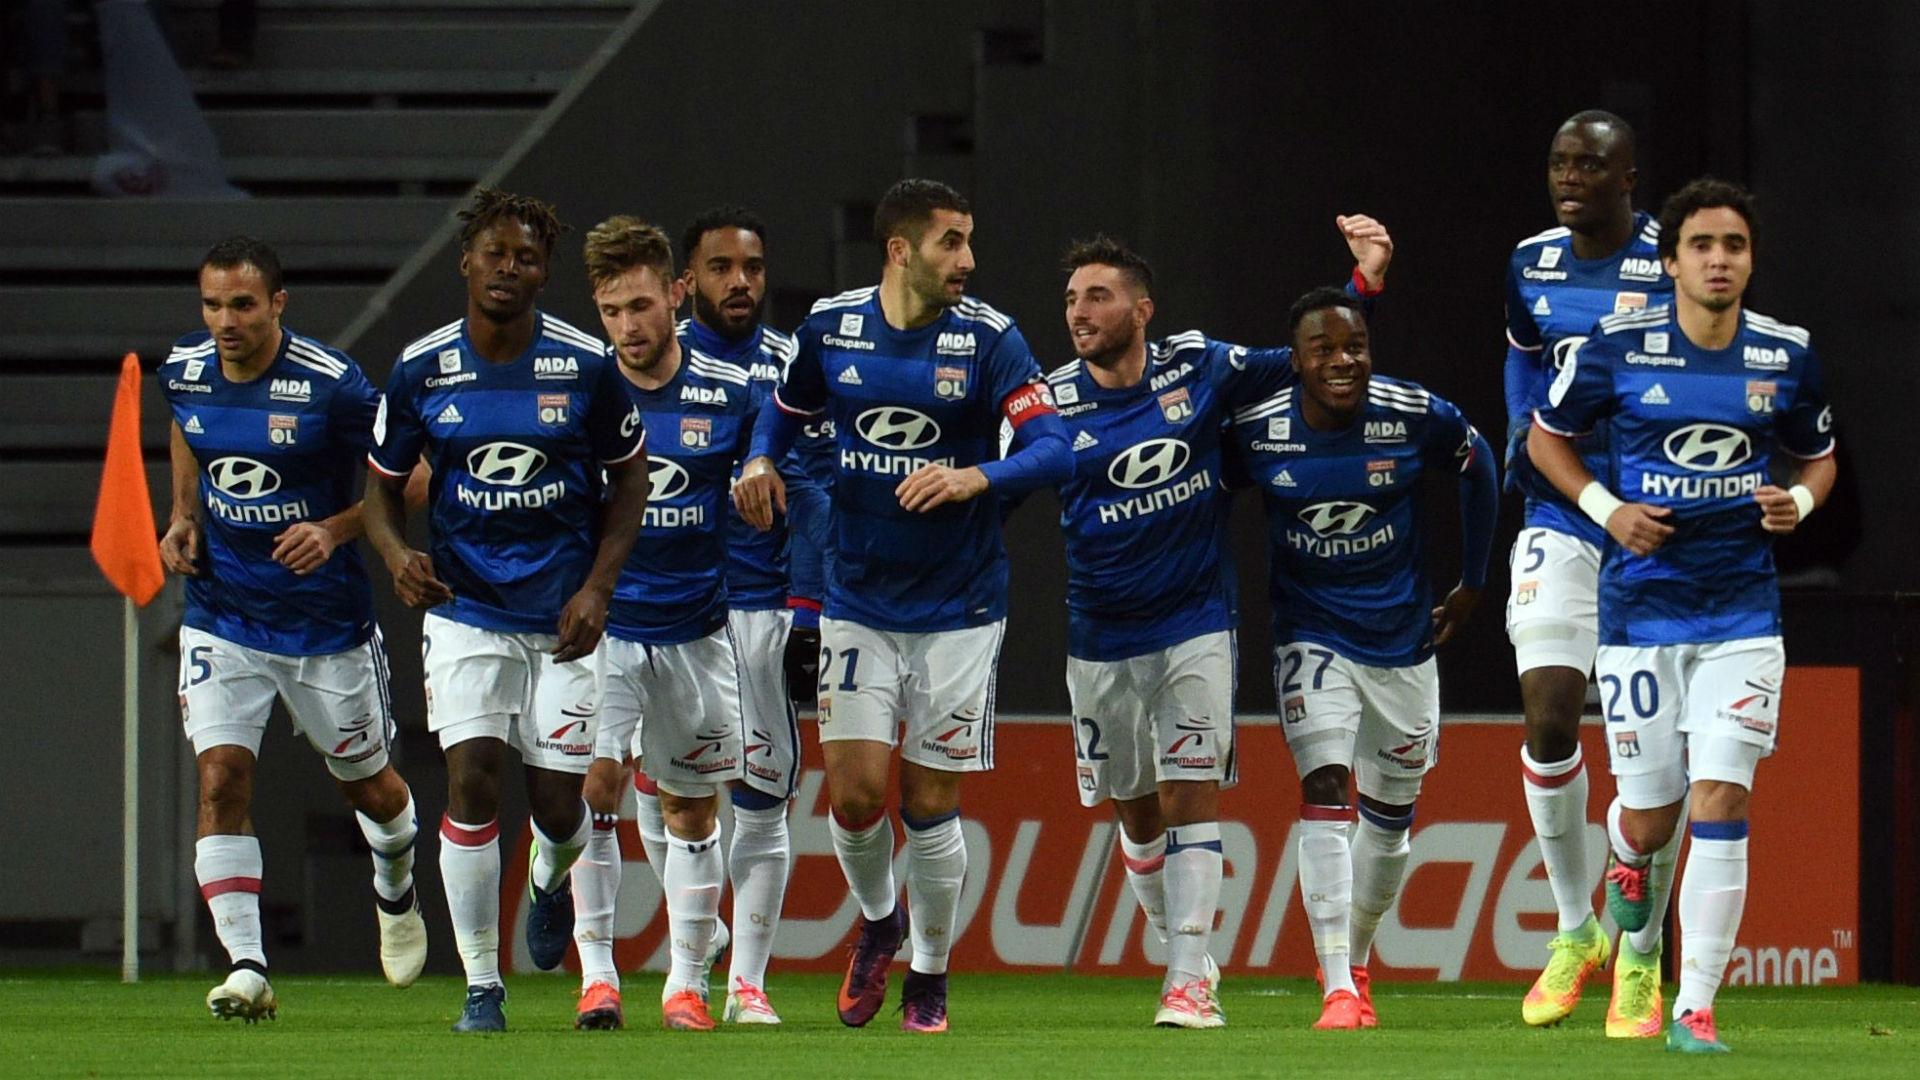 Lille - Lyon soccer prediction